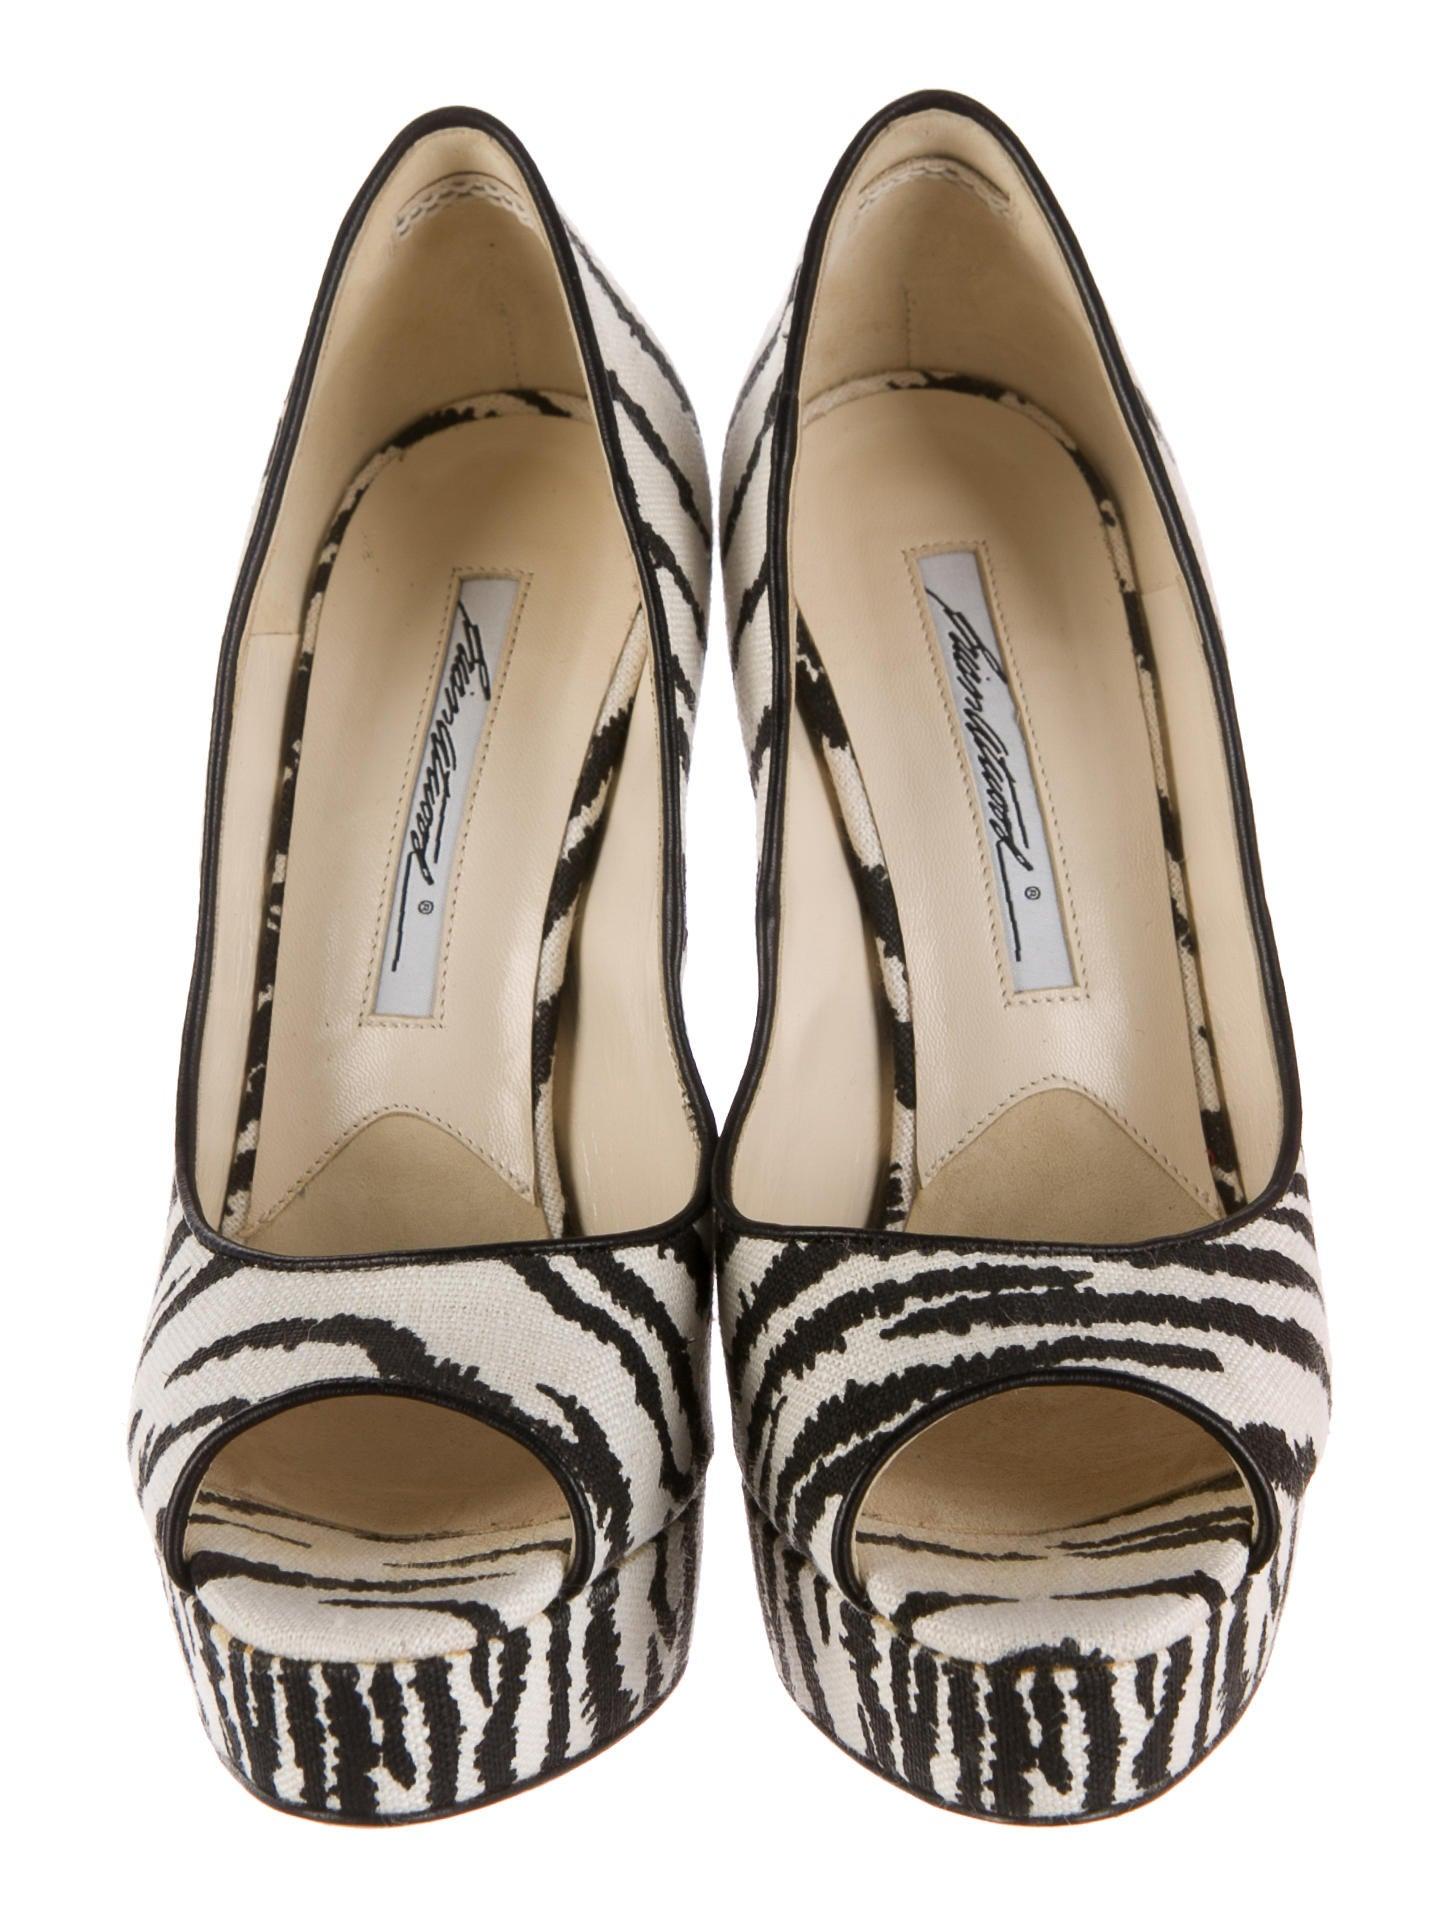 Brian Atwood Zebra Print Peep Toe Pumps Shoes Bri22600 The Realreal